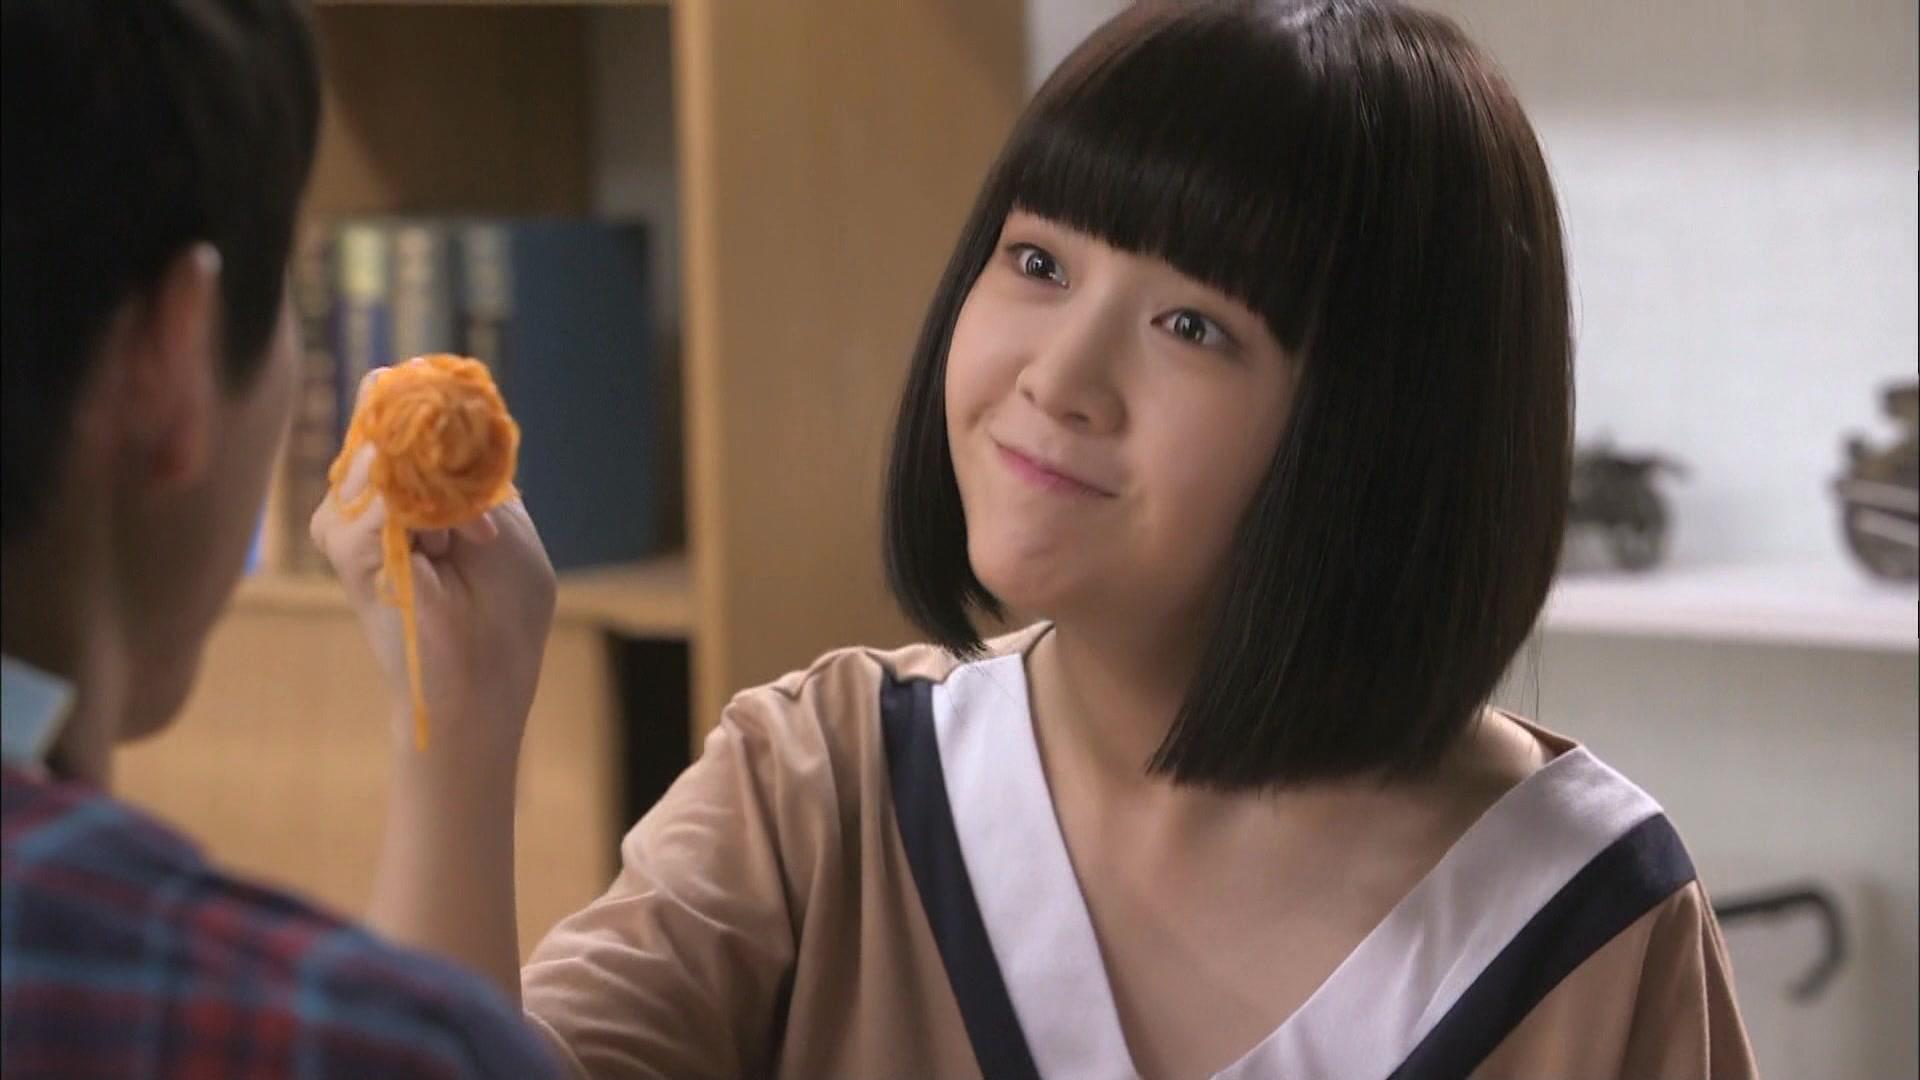 Dear Fair Lady Kong Shim Episode 6